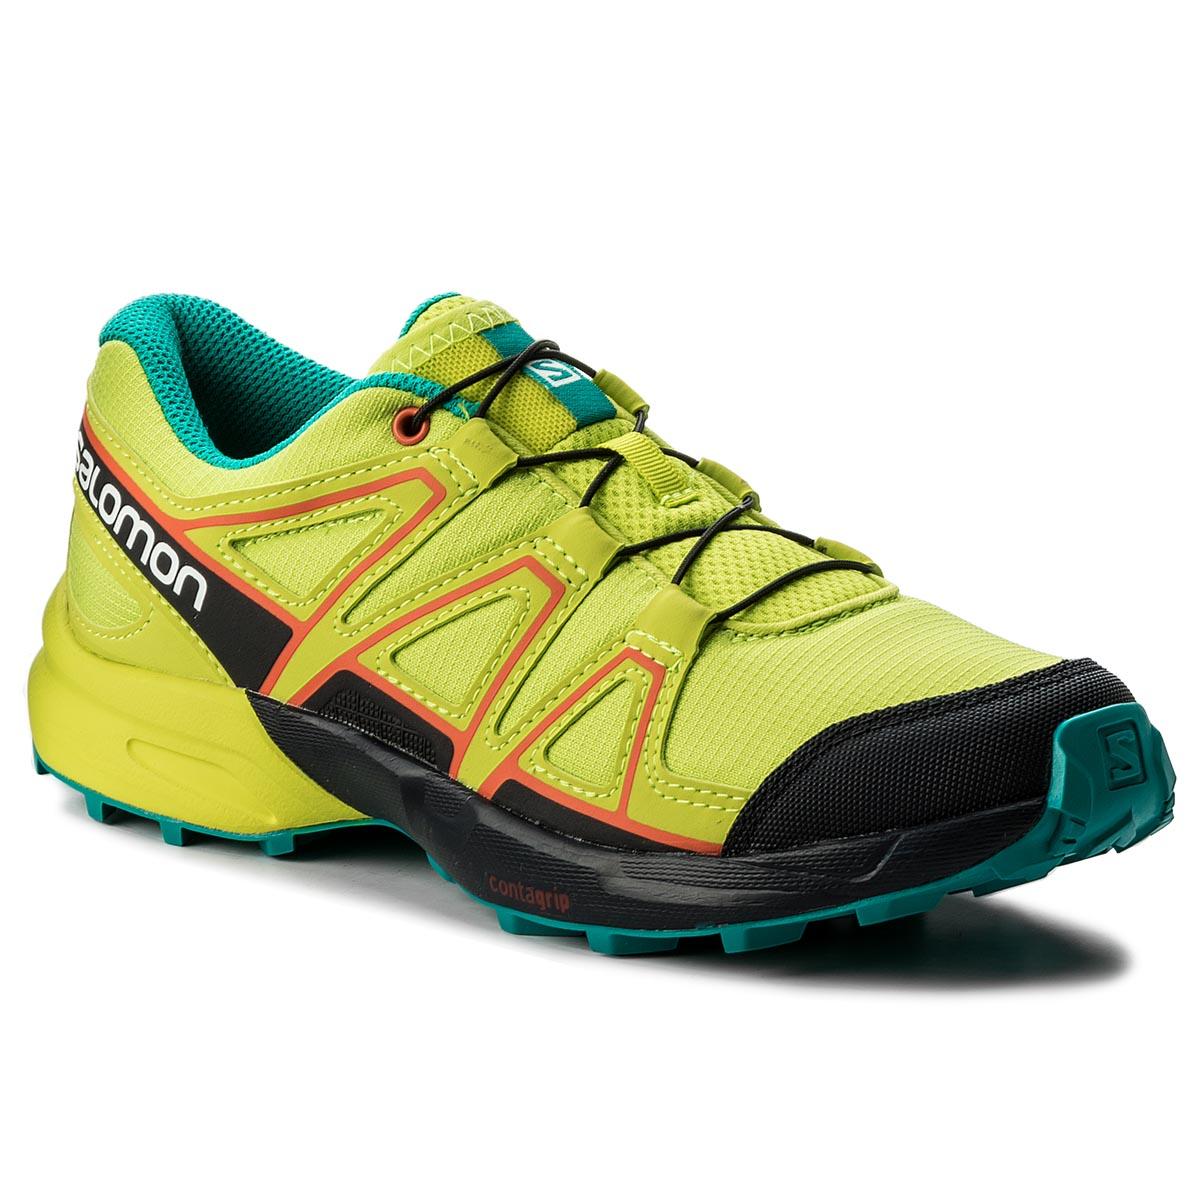 89c6e8579ed Trekingová obuv SALOMON - Speedcross J 401294 14 M0 Acid Lime Night ...